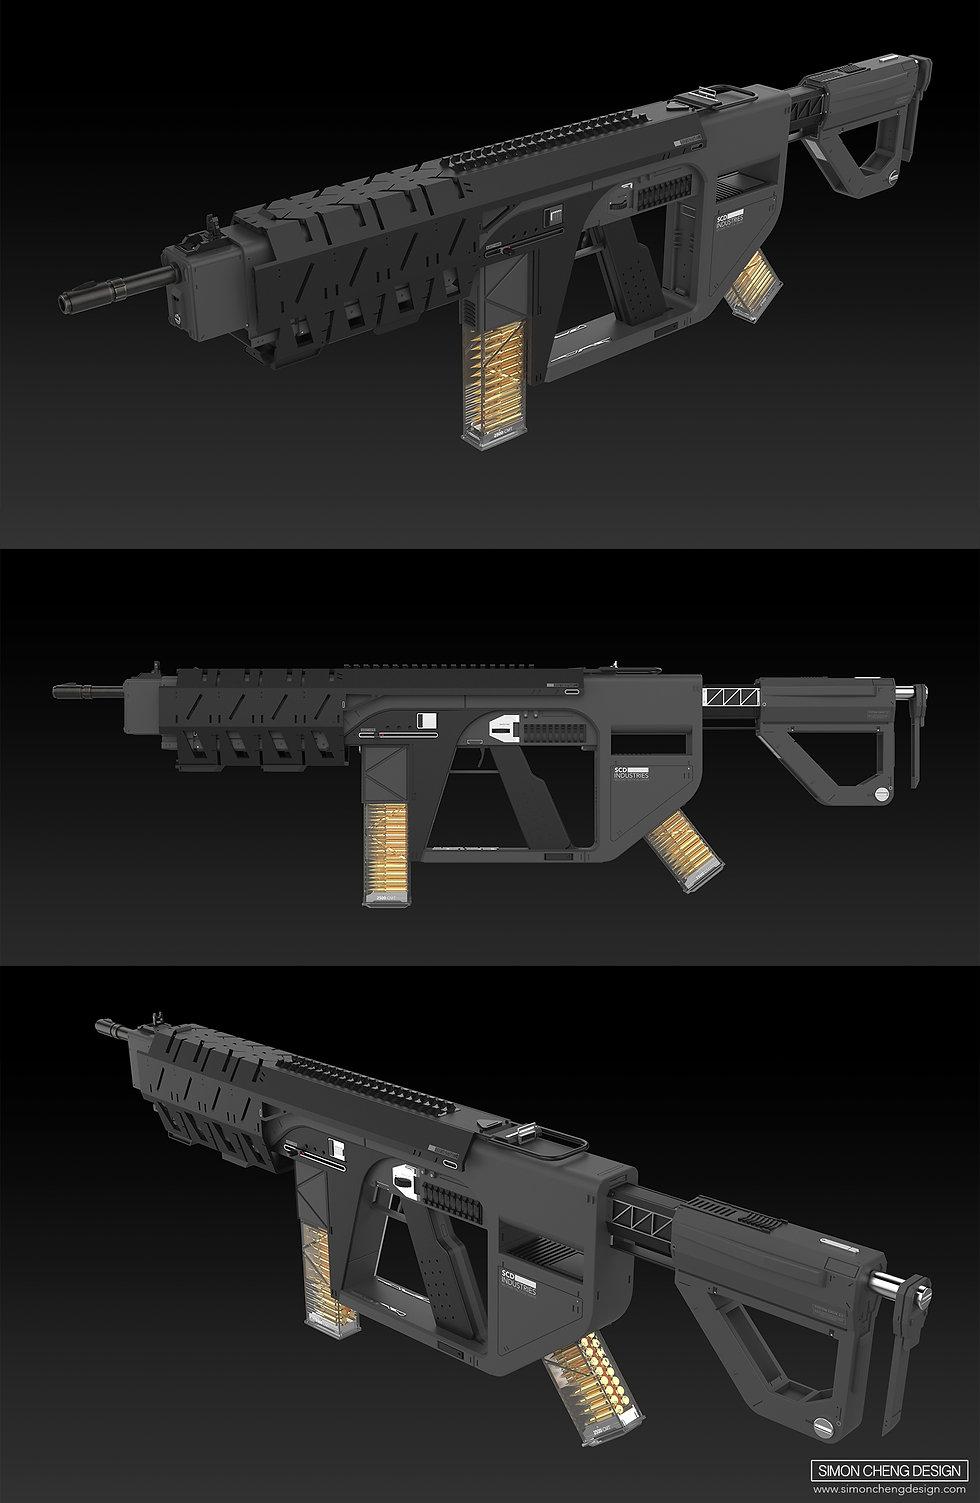 scd_weapon_036.jpg